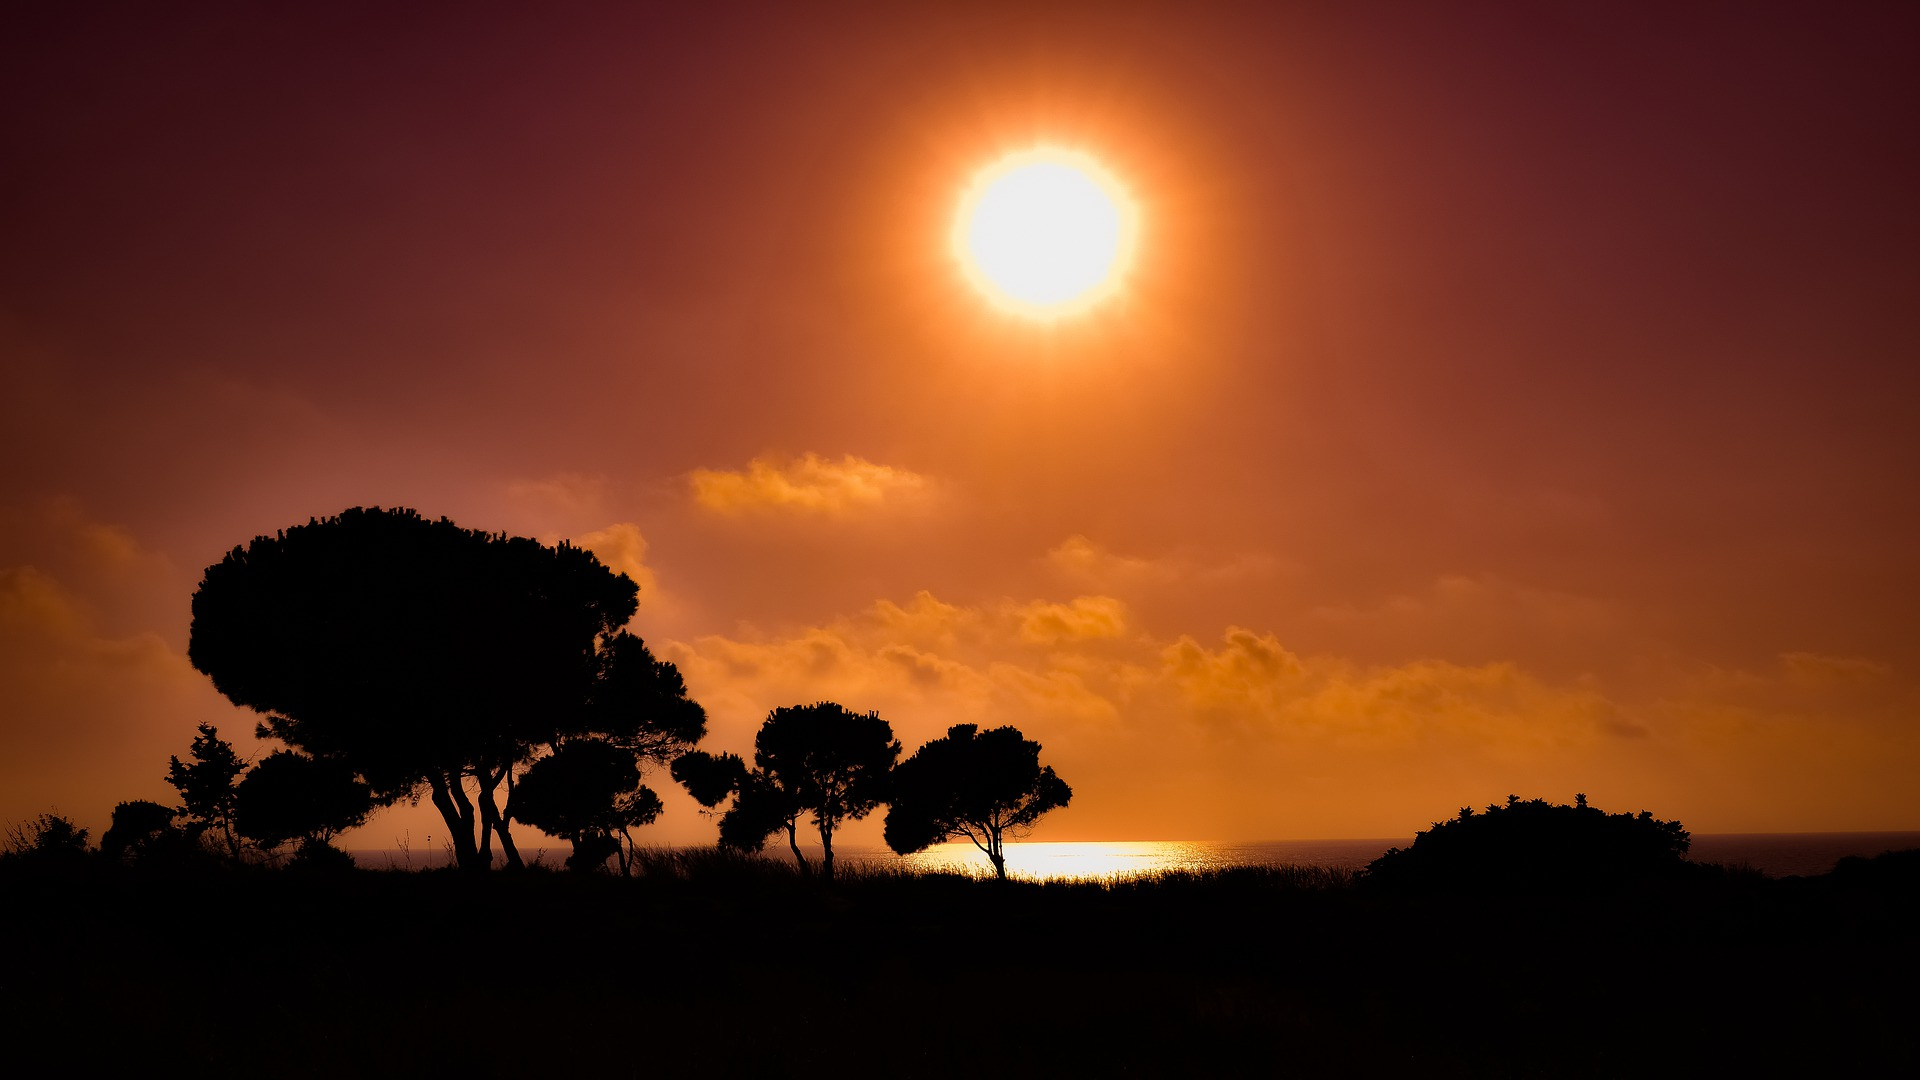 sunset-4437373_1920